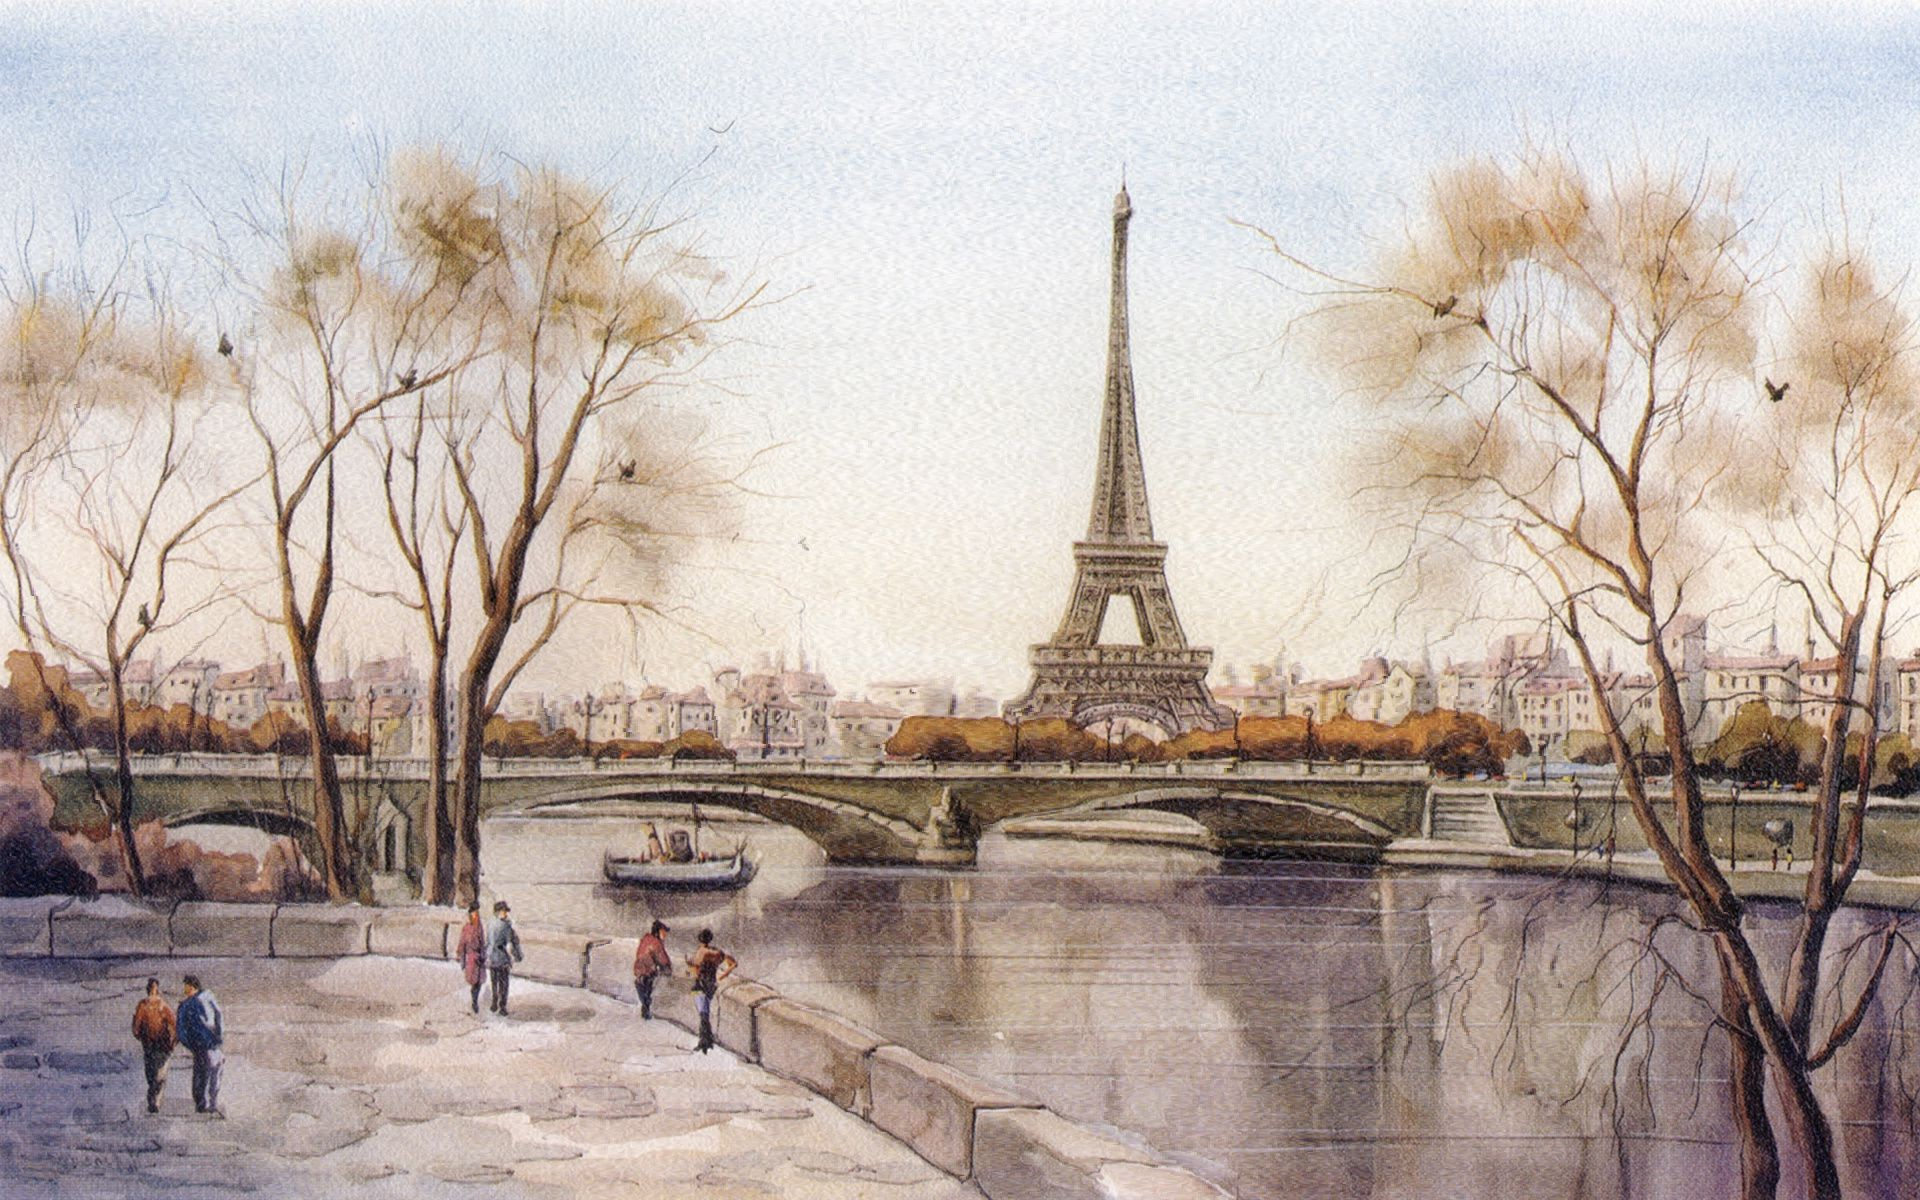 City Eiffel Tower Paris River France Picture. Android